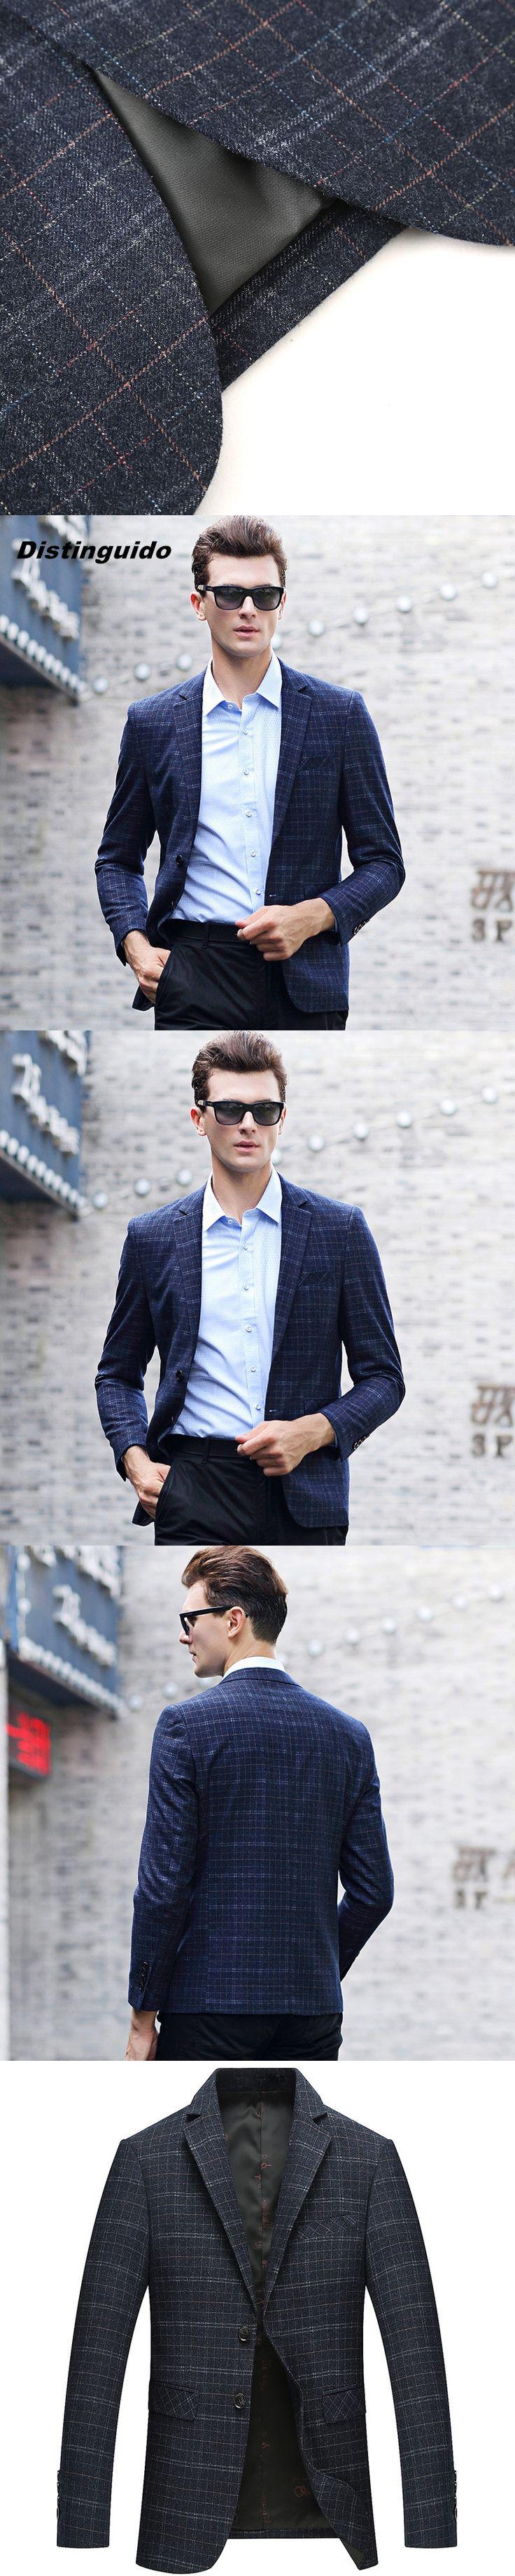 2017 Atutumn Winter New Blazer Men Fashion Blue Plaid Casual Suits  Brand Clothing MBL002